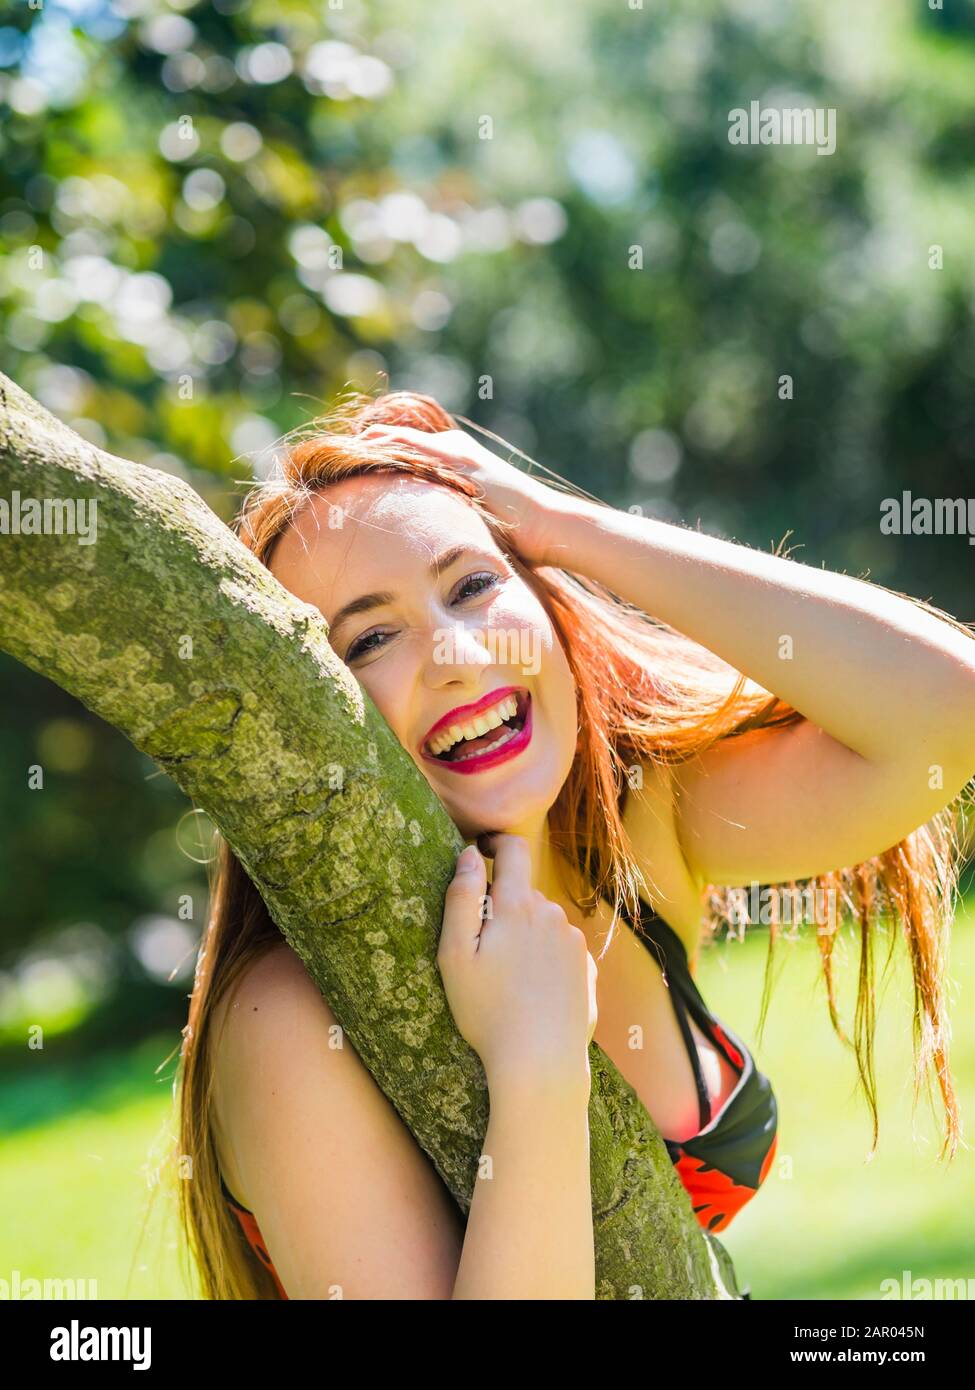 Mujer joven Foto de stock